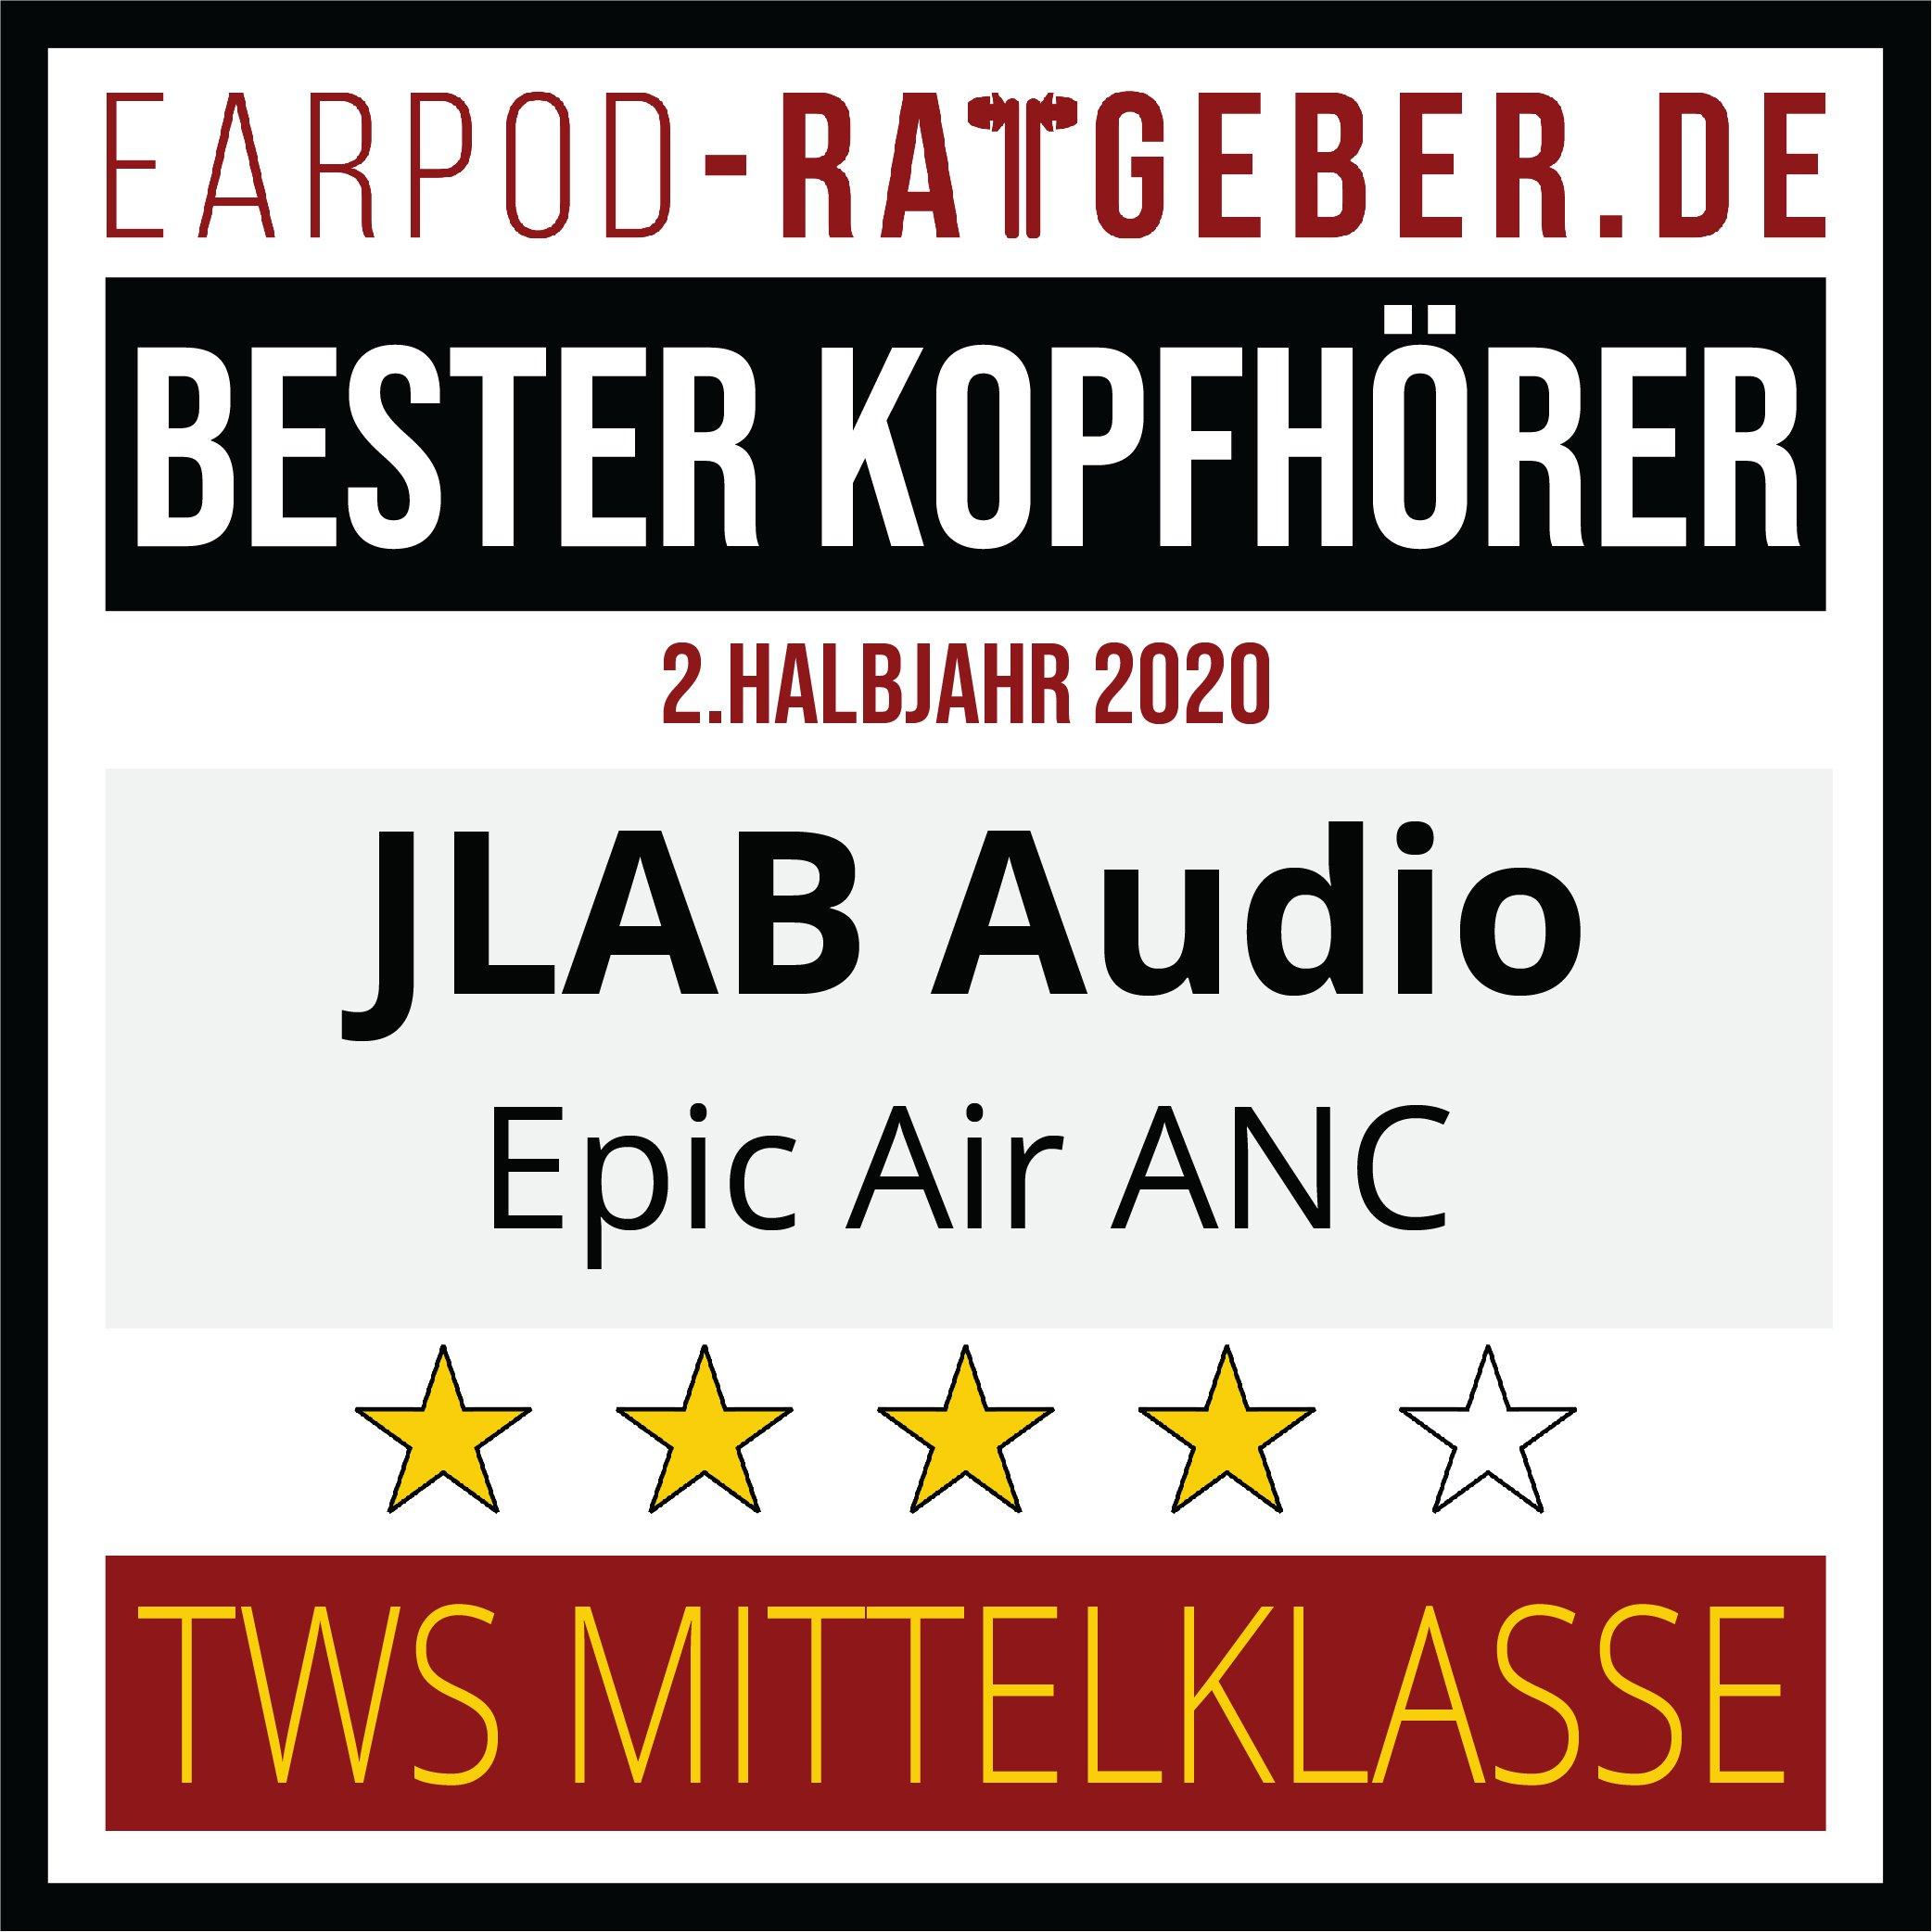 Die besten Kopfhörer 2020 Earpod-Ratgeber.de Awards Einsteiger JLAB 1.HJ